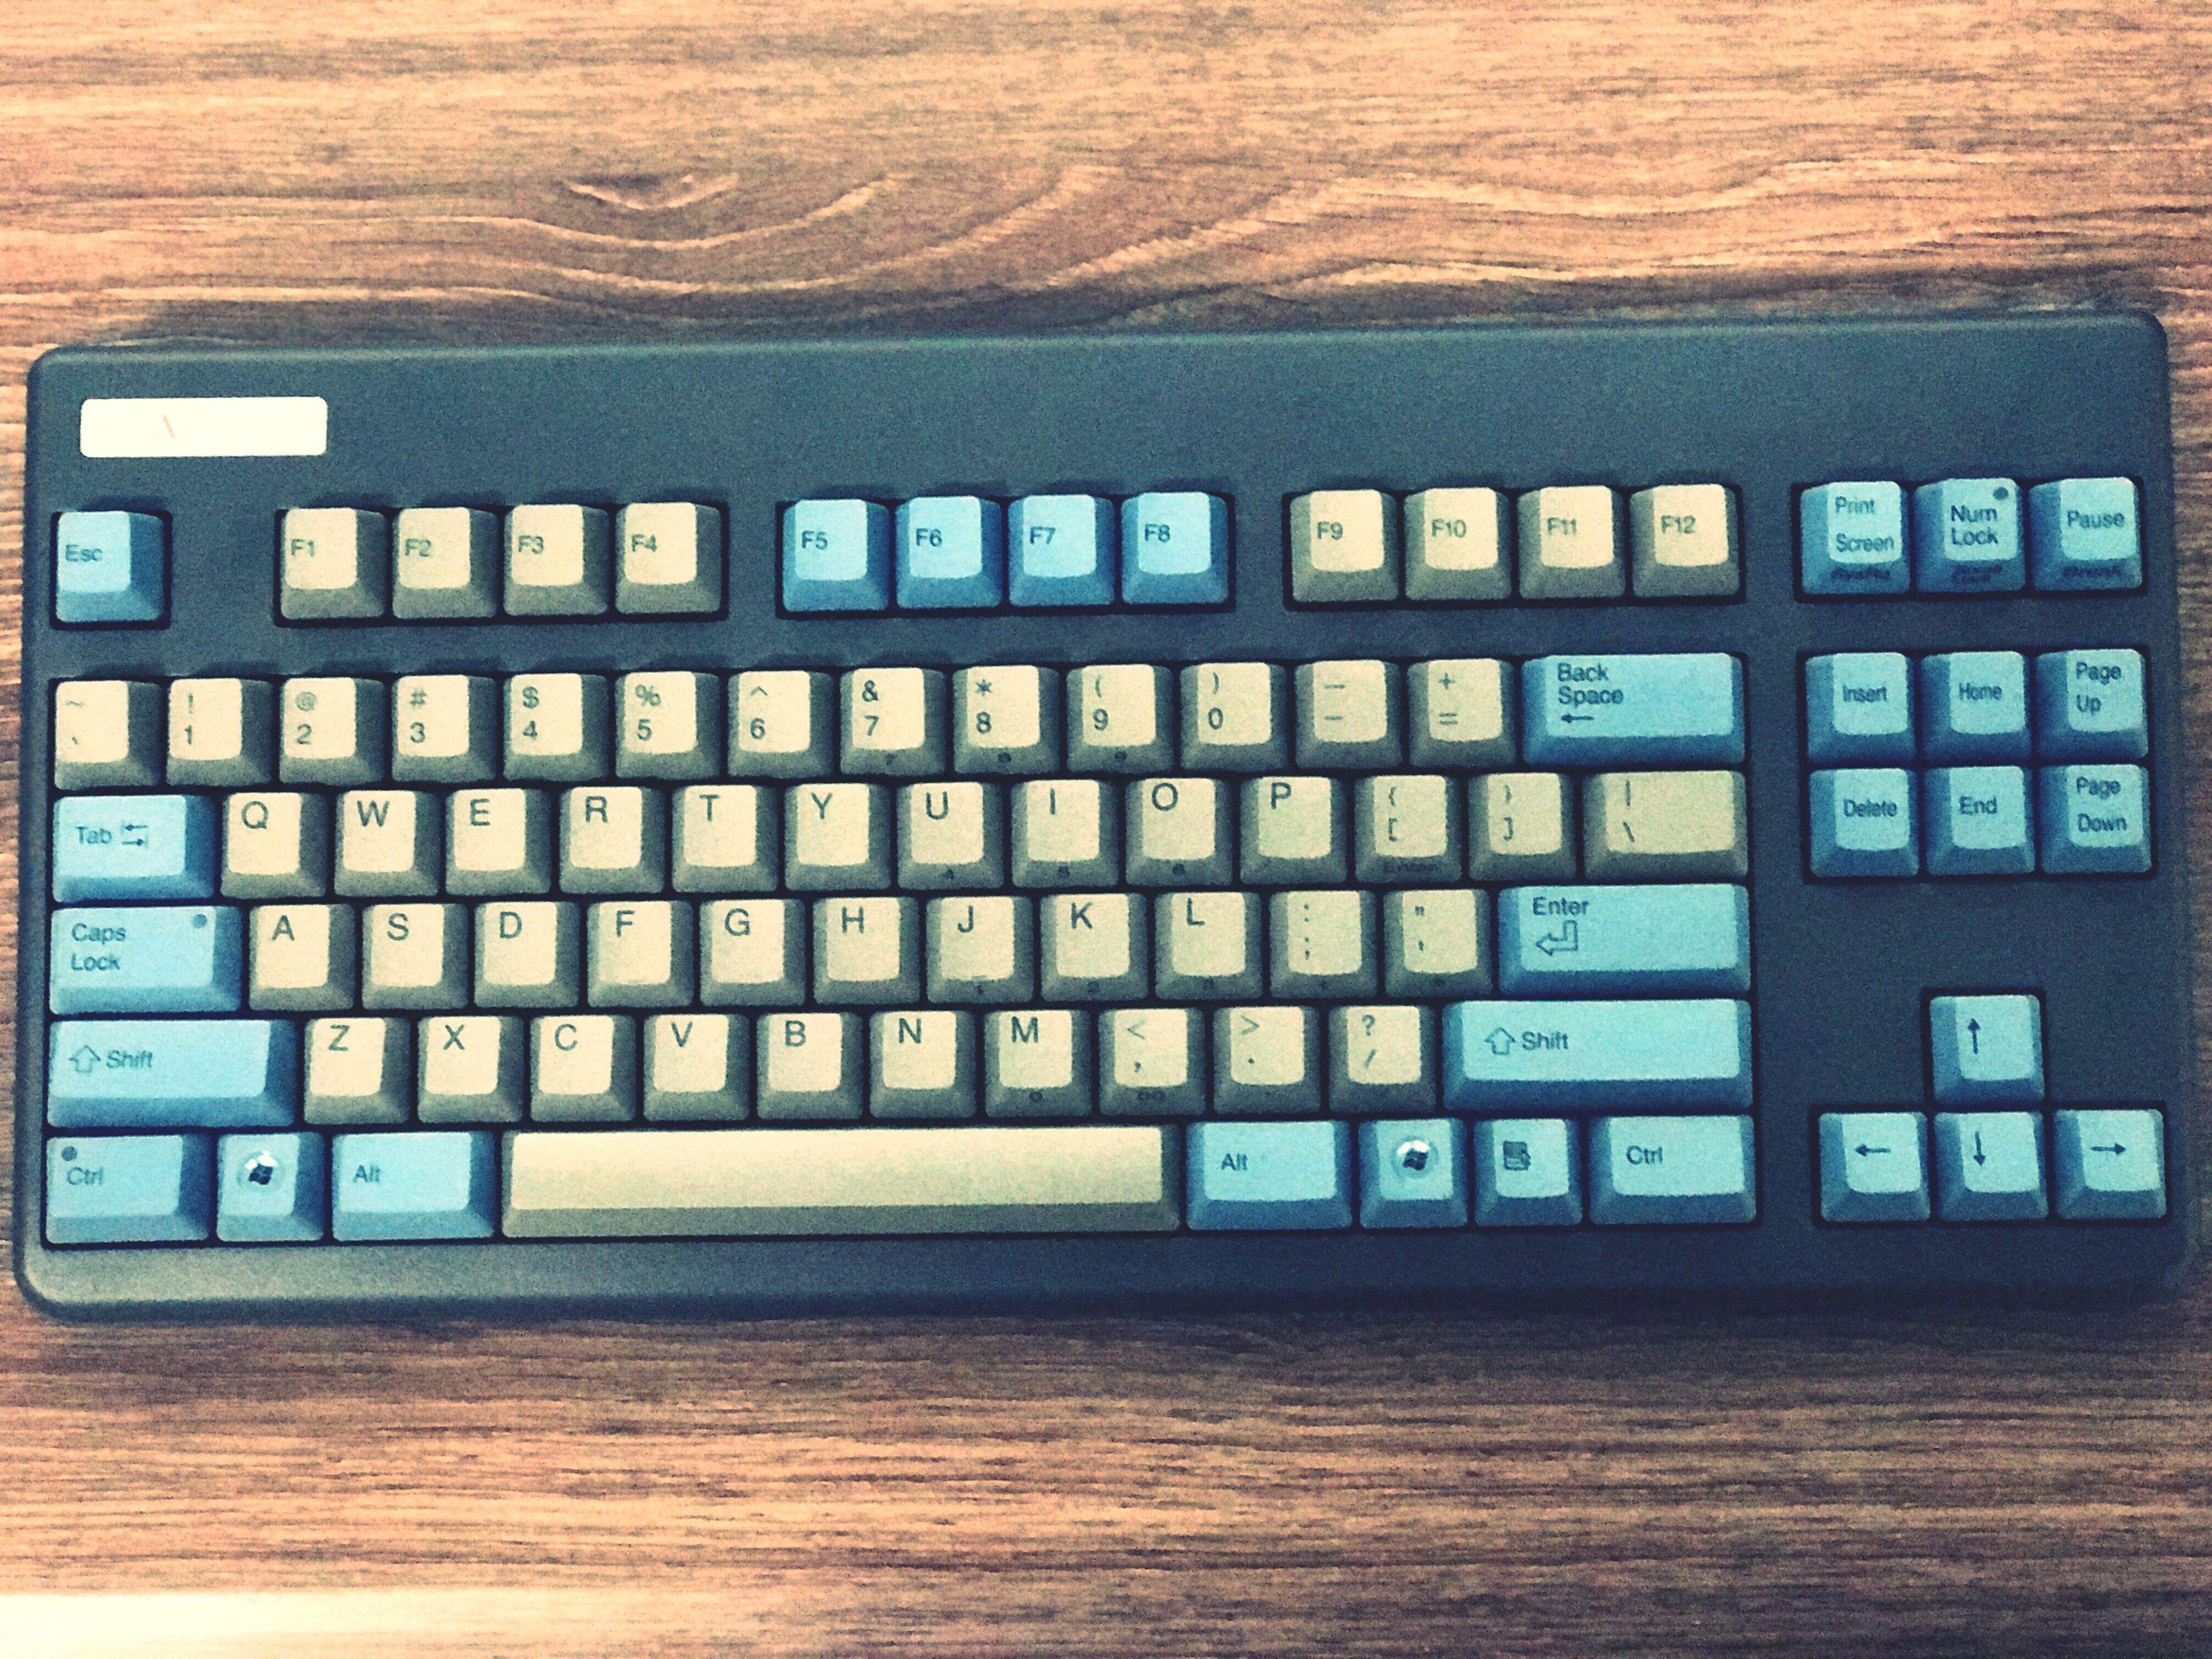 Realforce Keyboard